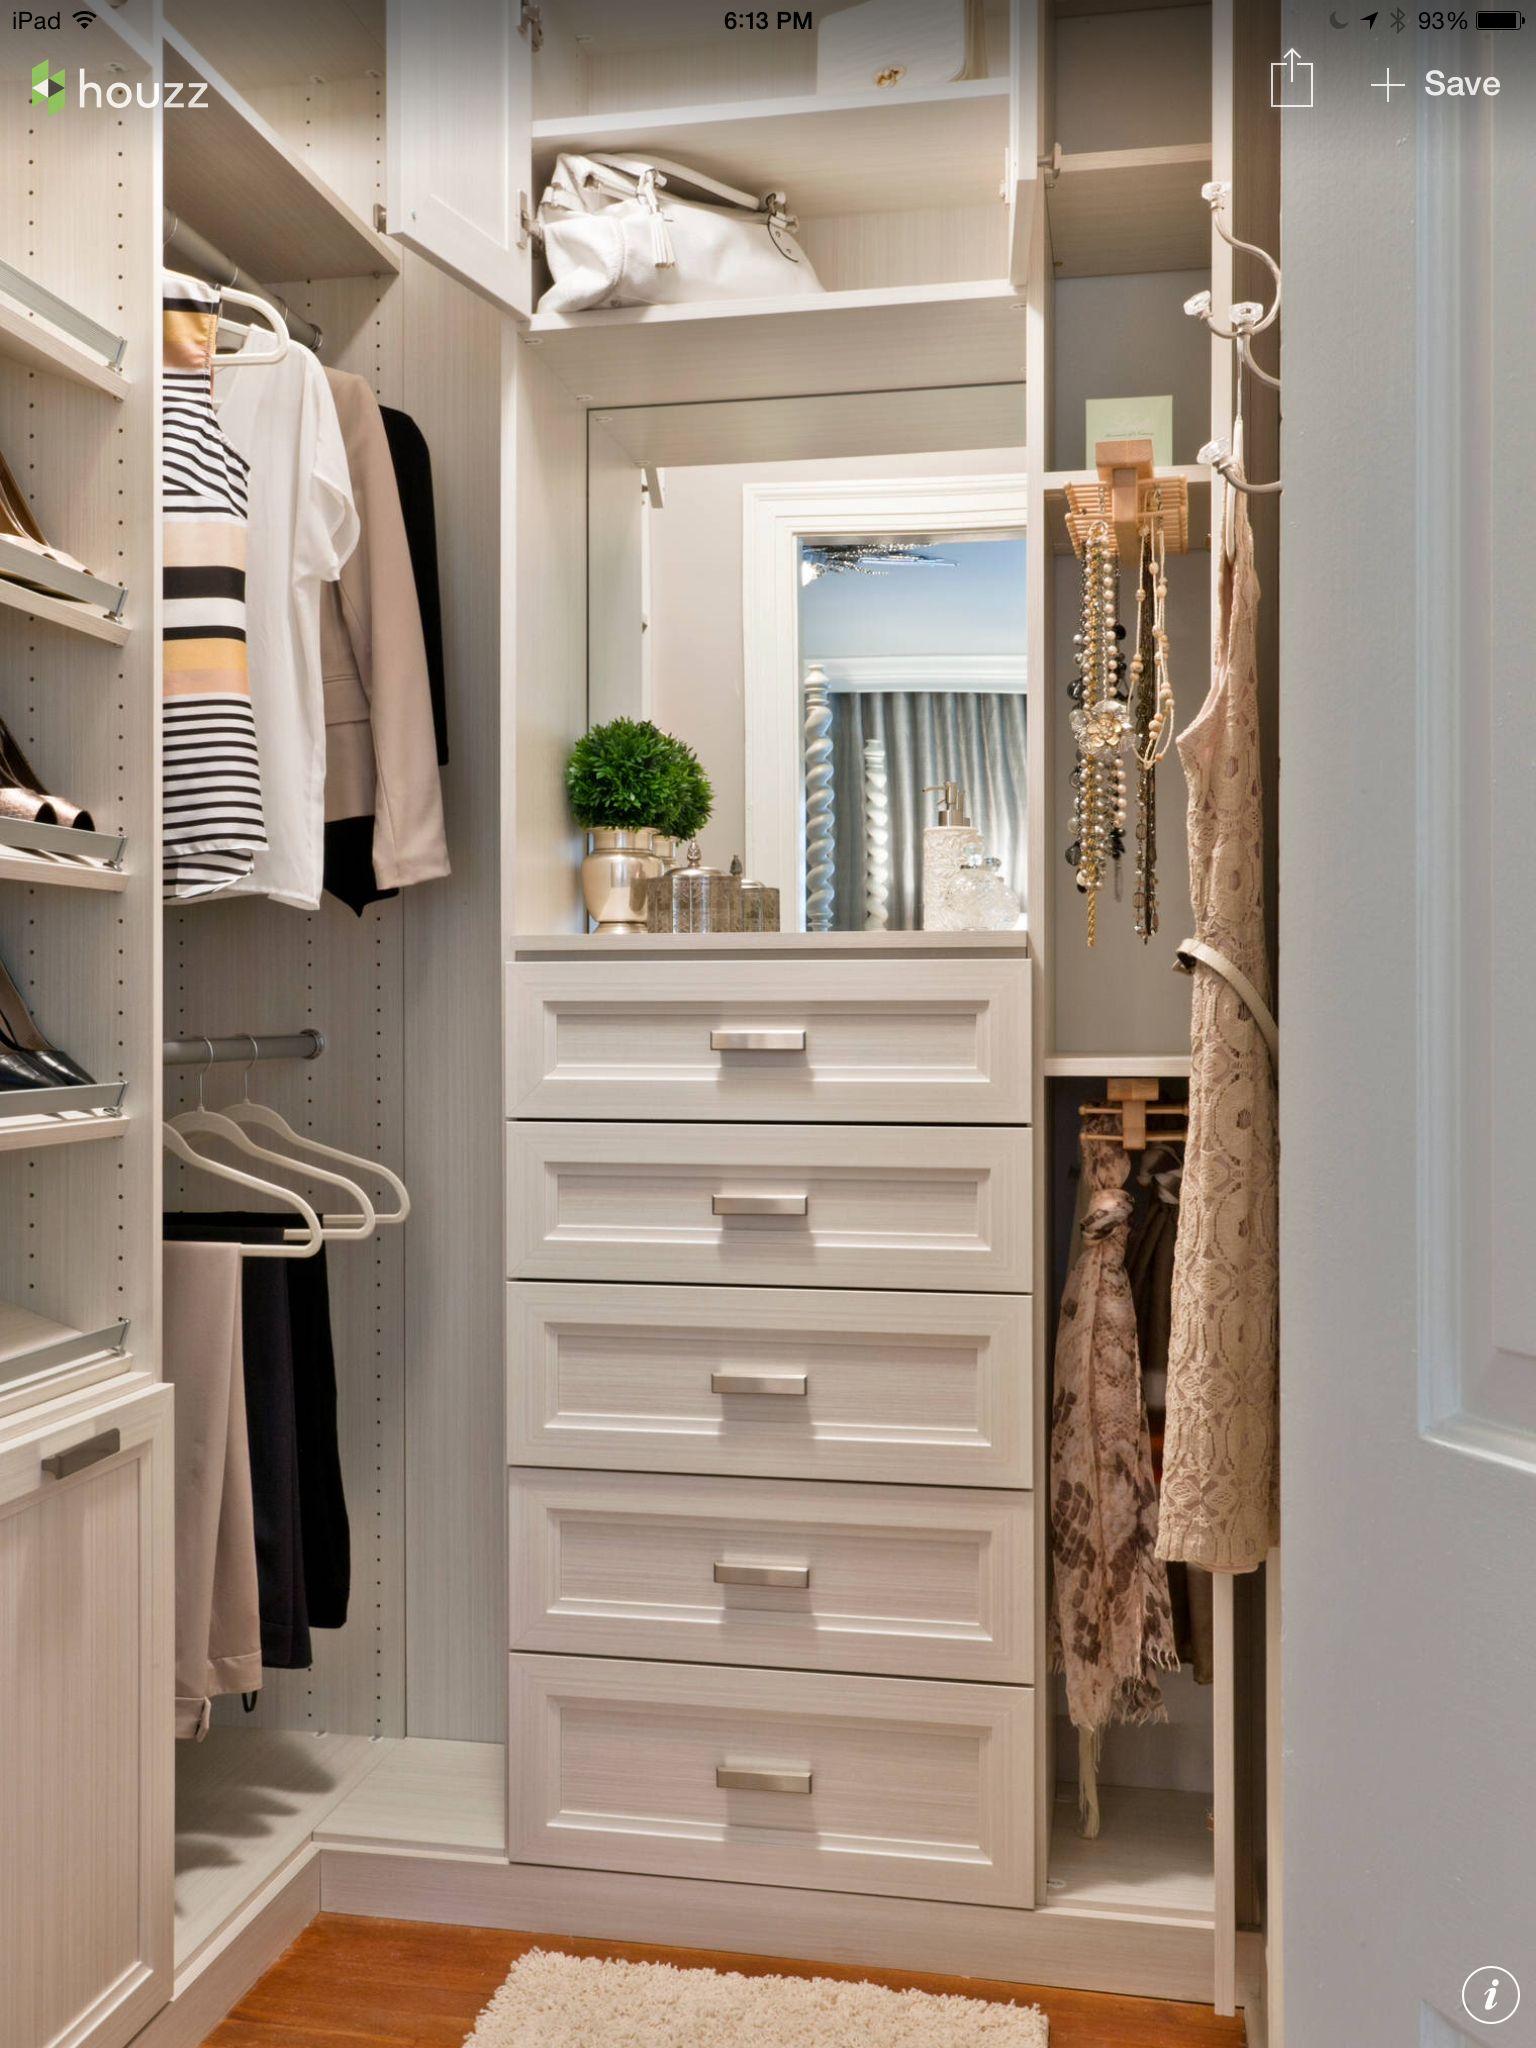 Best Closet 1 Closet Decor Closet Remodel Closet Makeover 400 x 300